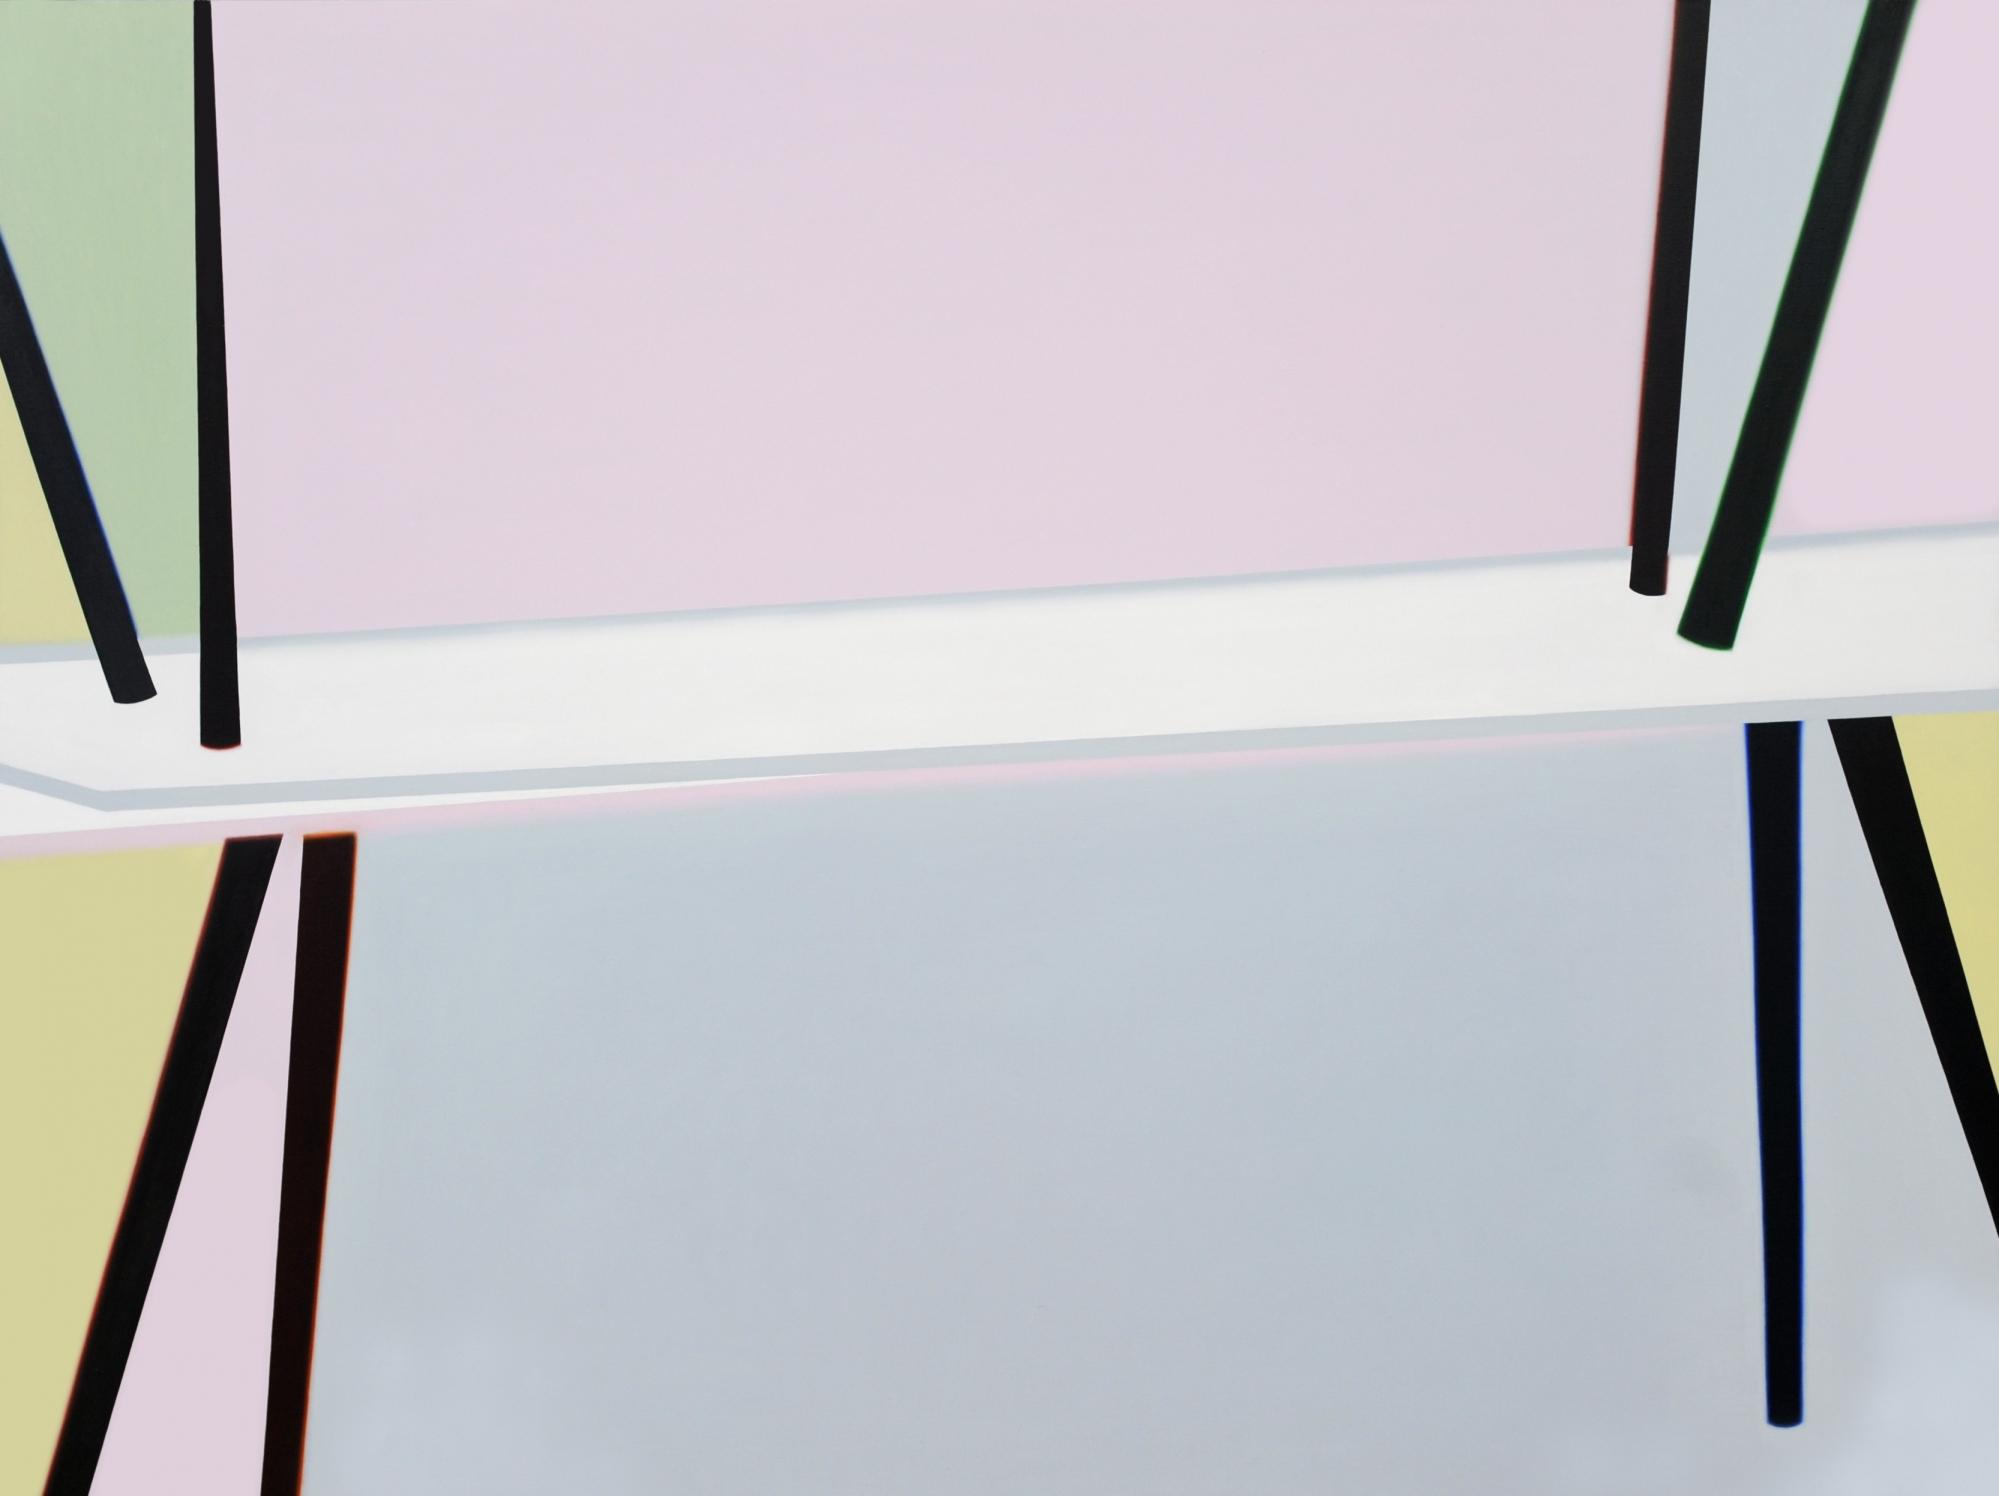 Tables 200x150cm oil and acrylic on canvas 2019